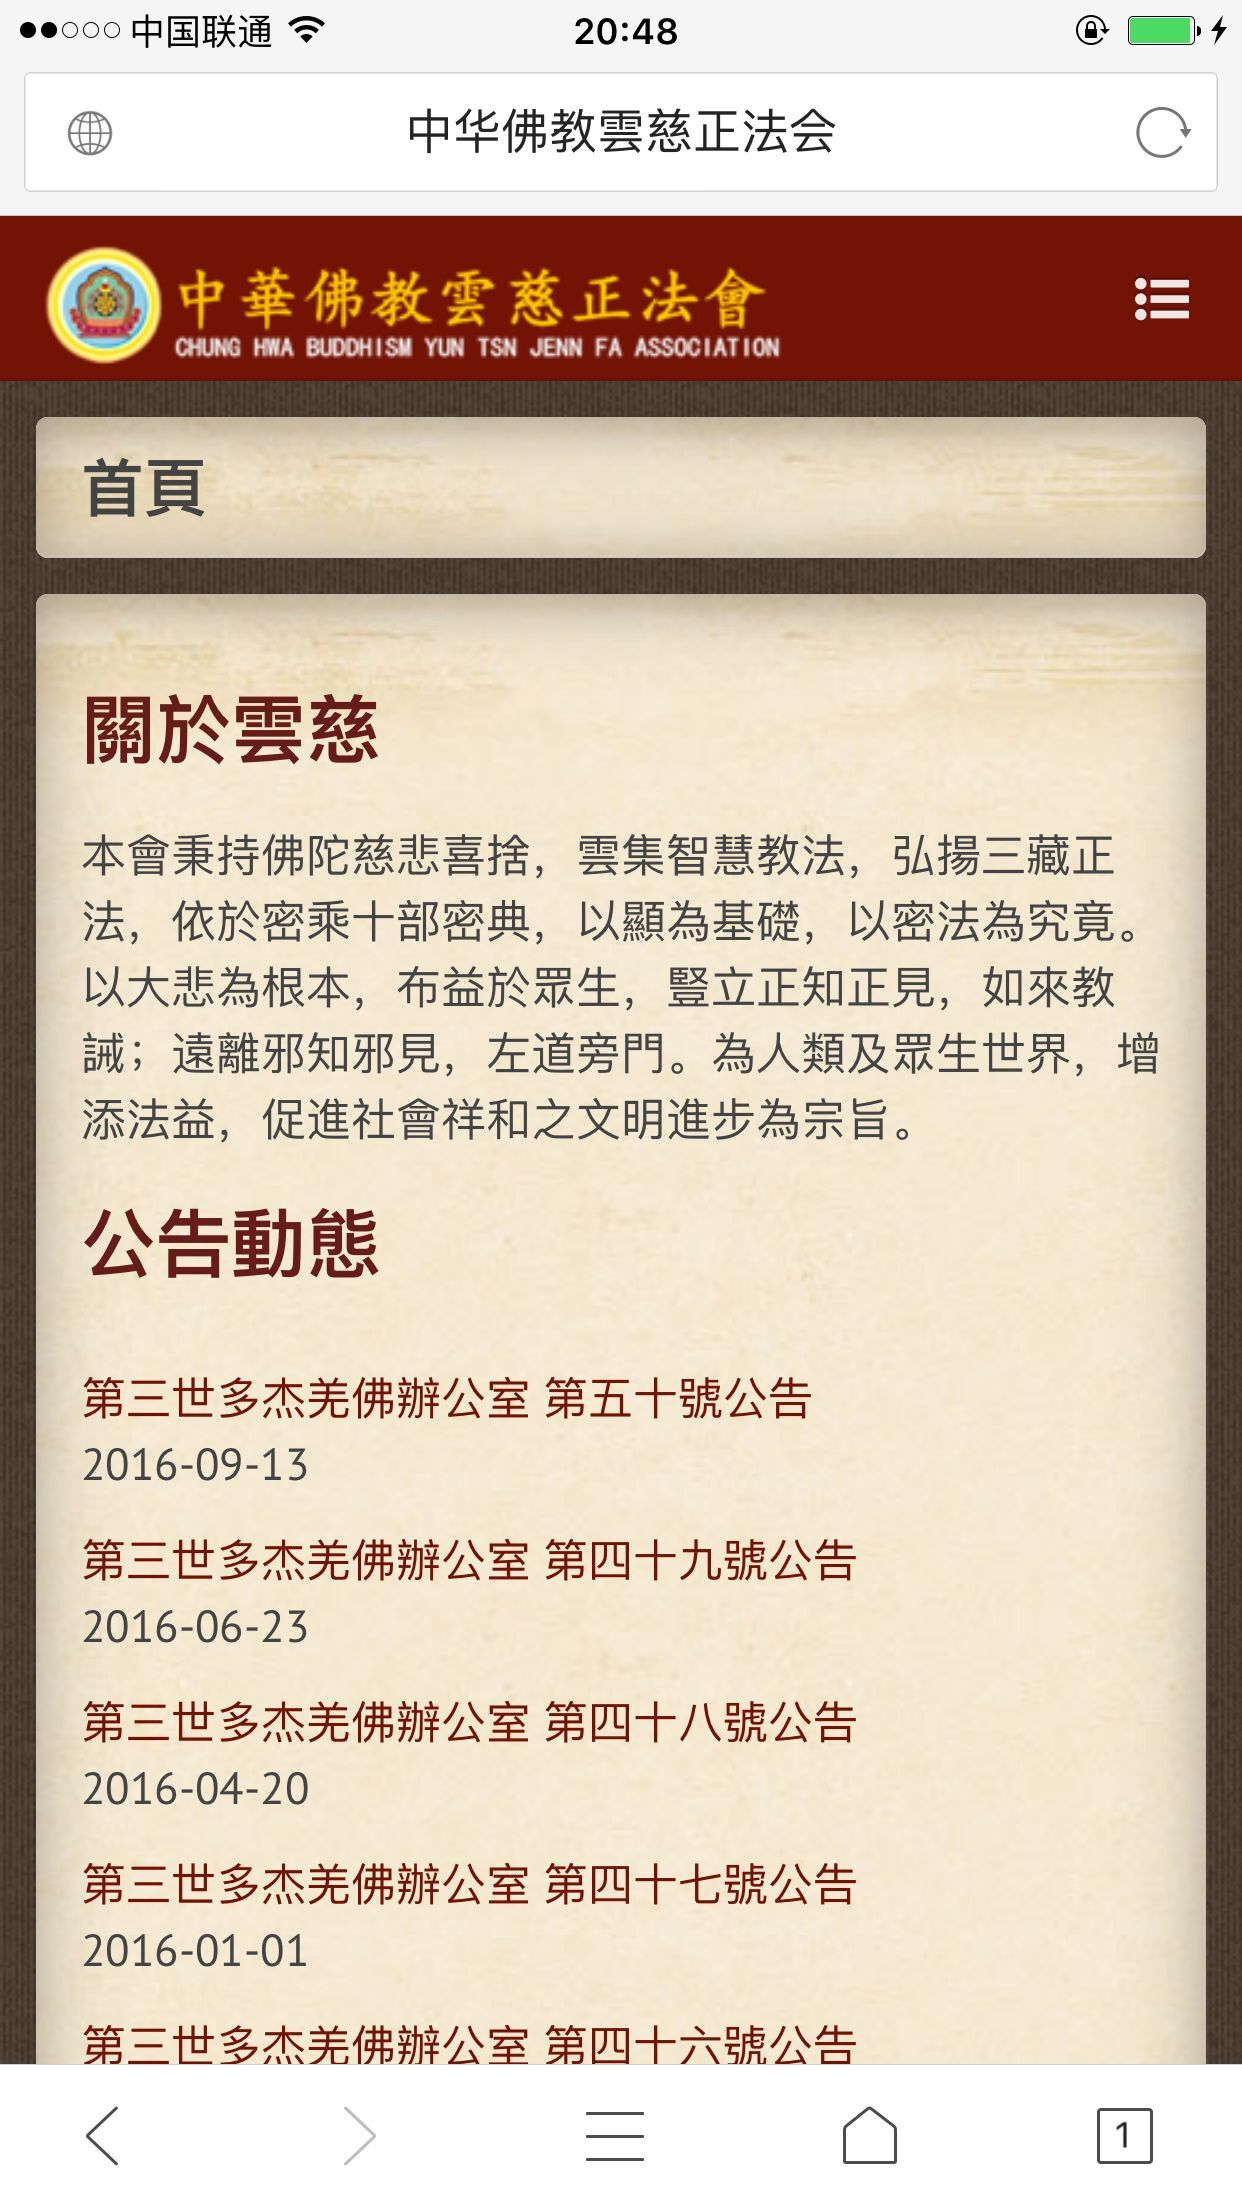 m1 中华佛教云慈正法会(台湾)